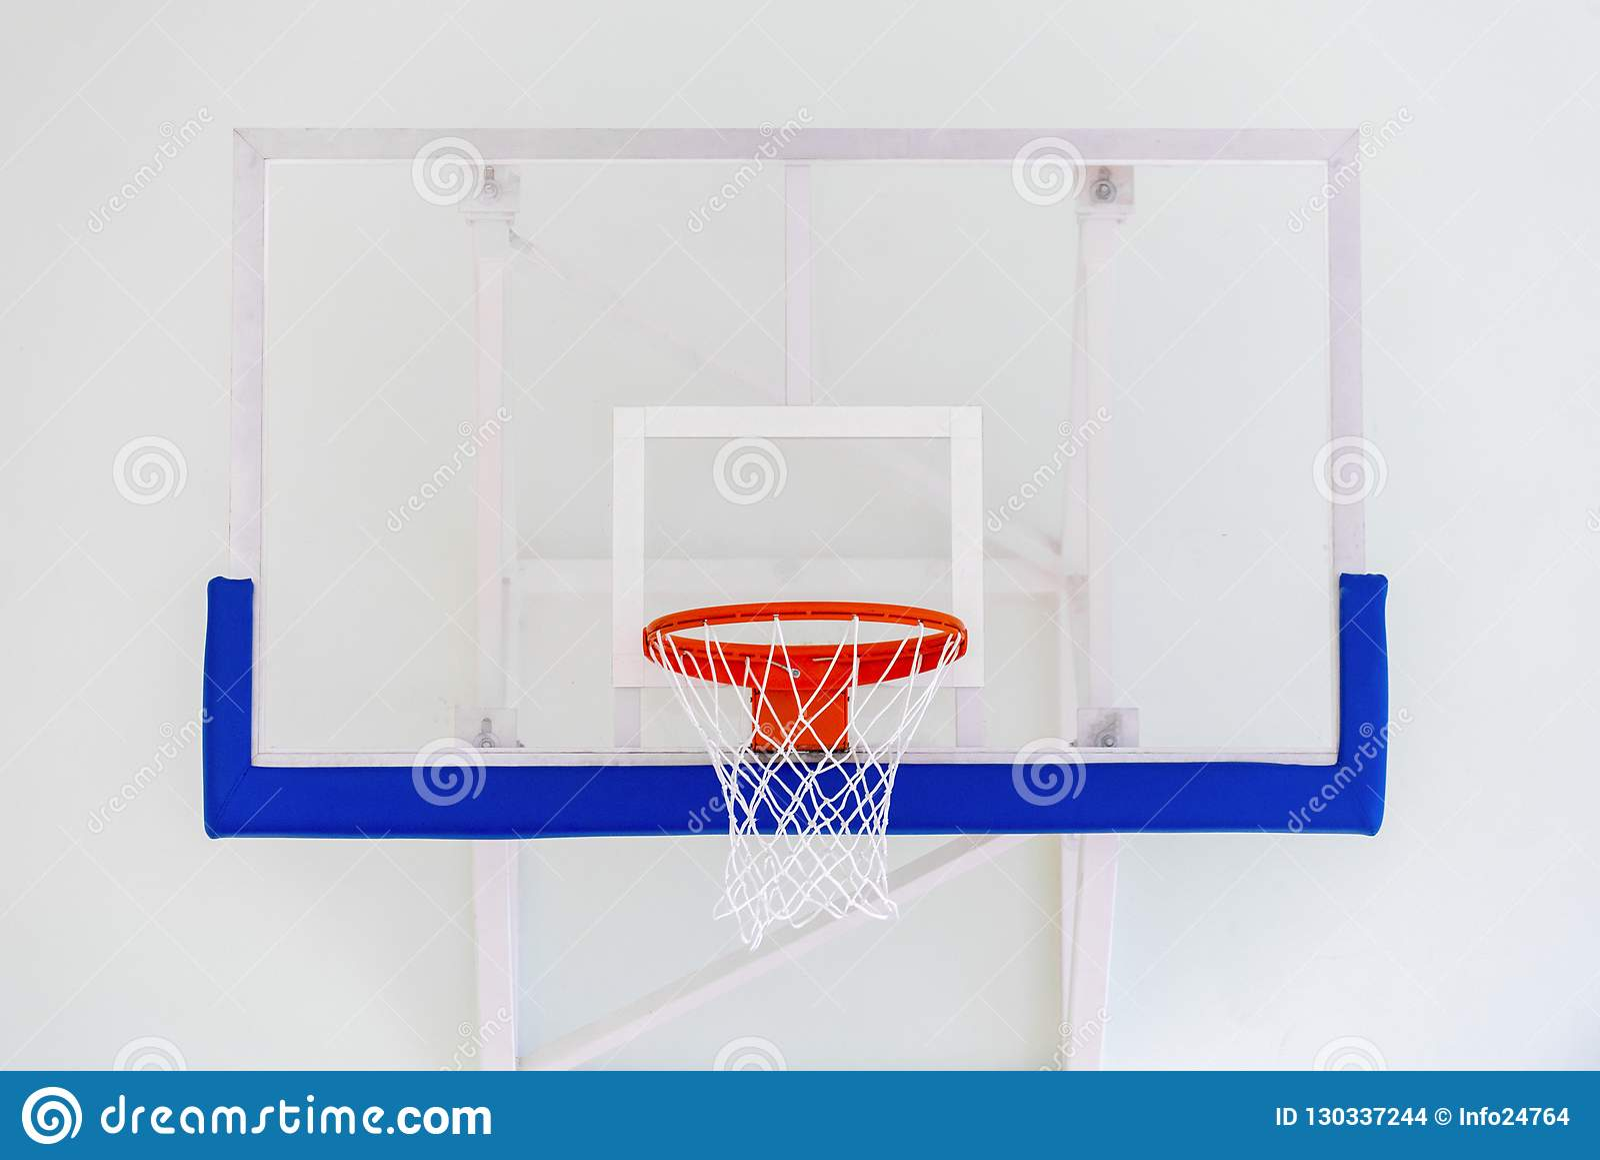 De kooi van de basketbalhoepel, geïsoleerde grote rugplankclose-up, nieuwe outd